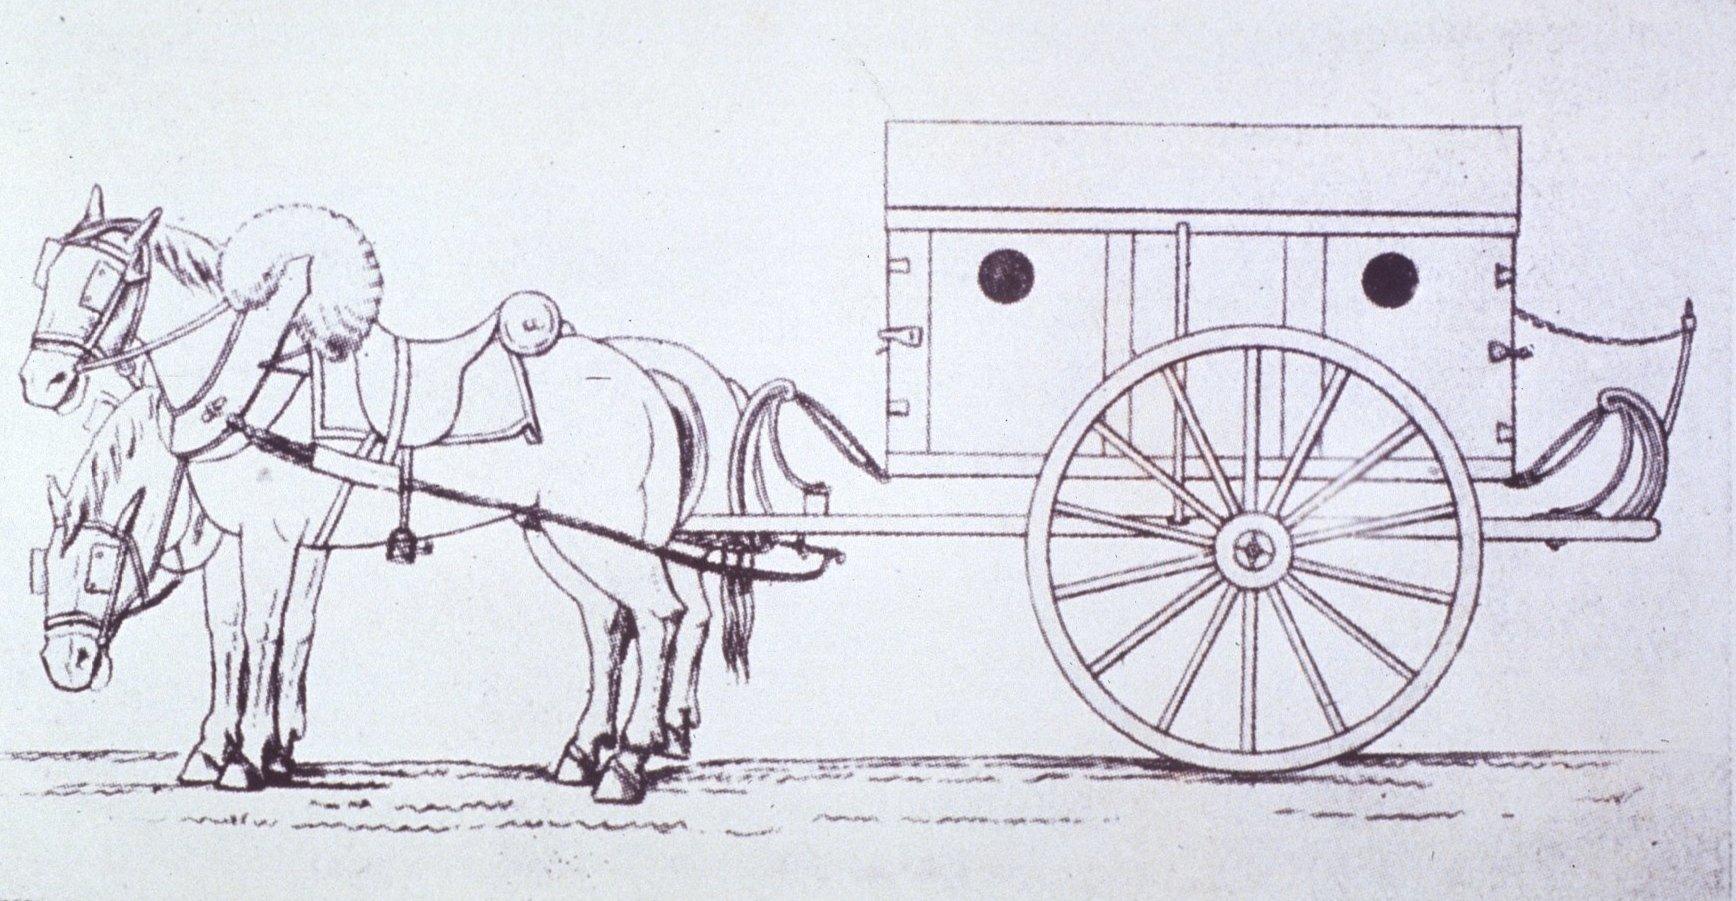 File:Larrey's Flying Ambulance.jpg - Wikimedia Commons